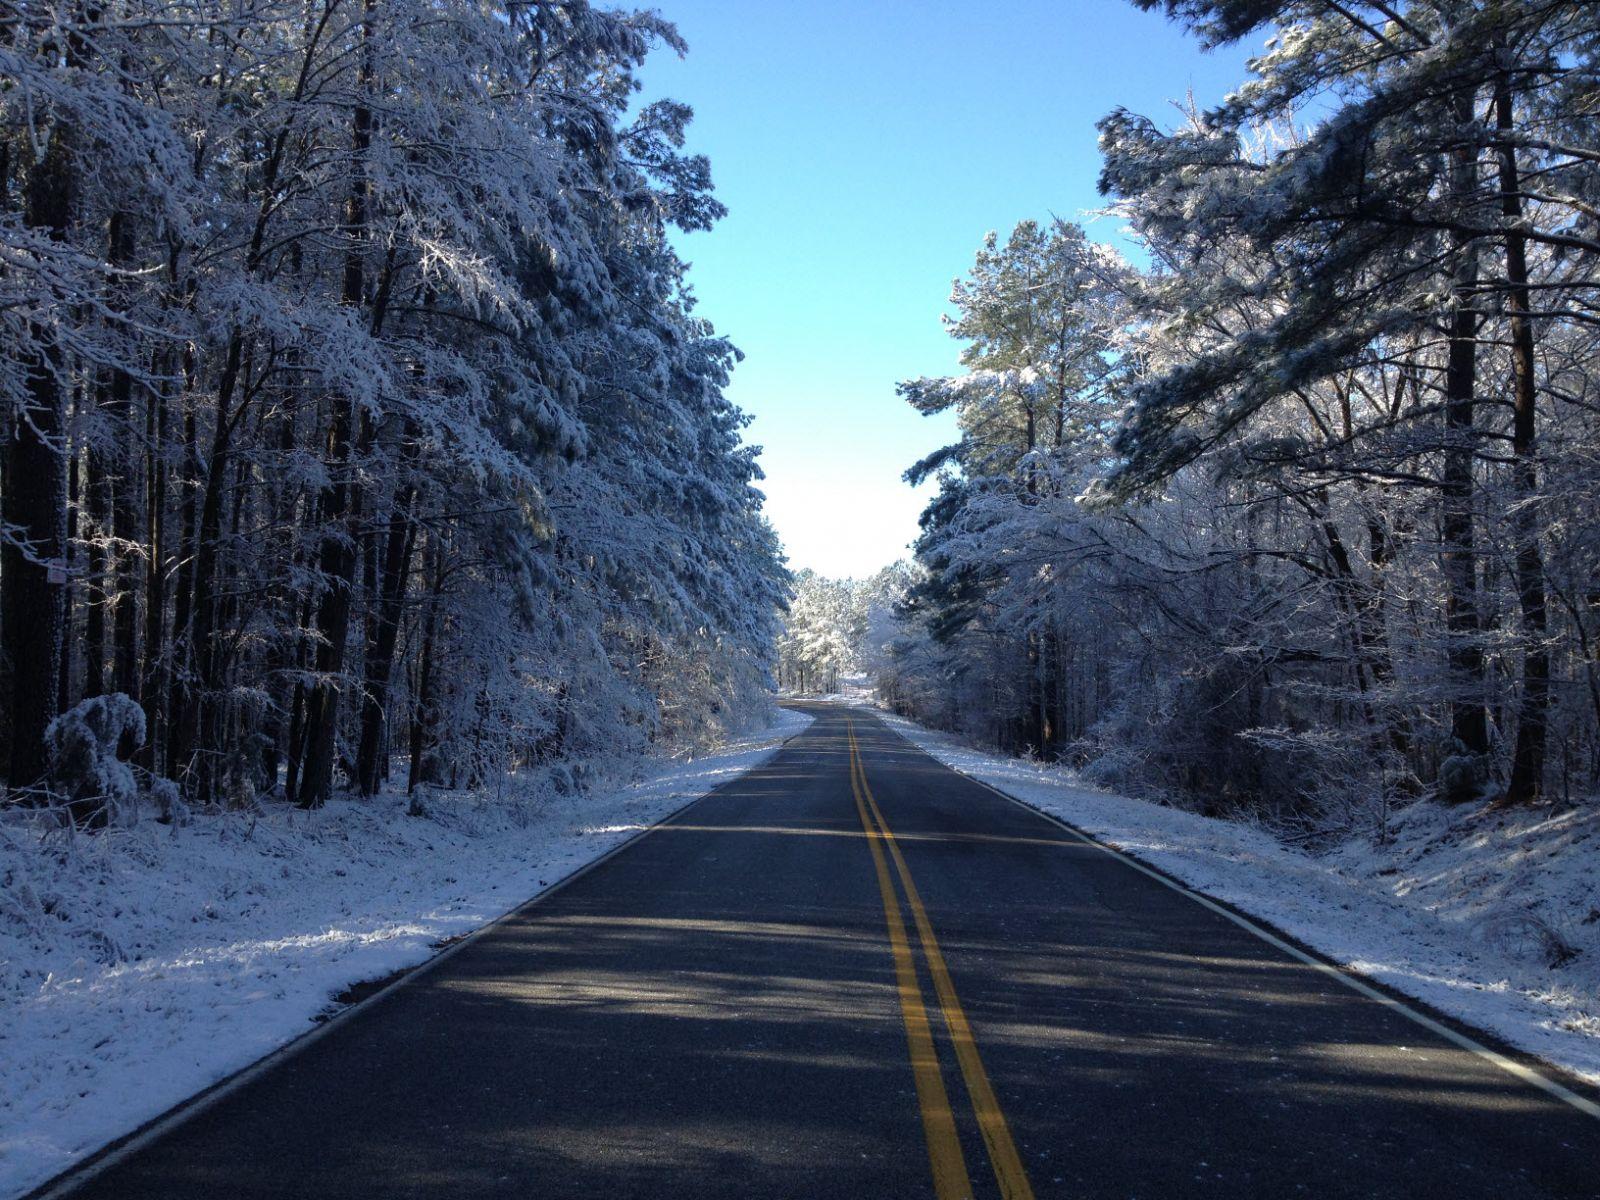 February 16th, 2013 Snow Event